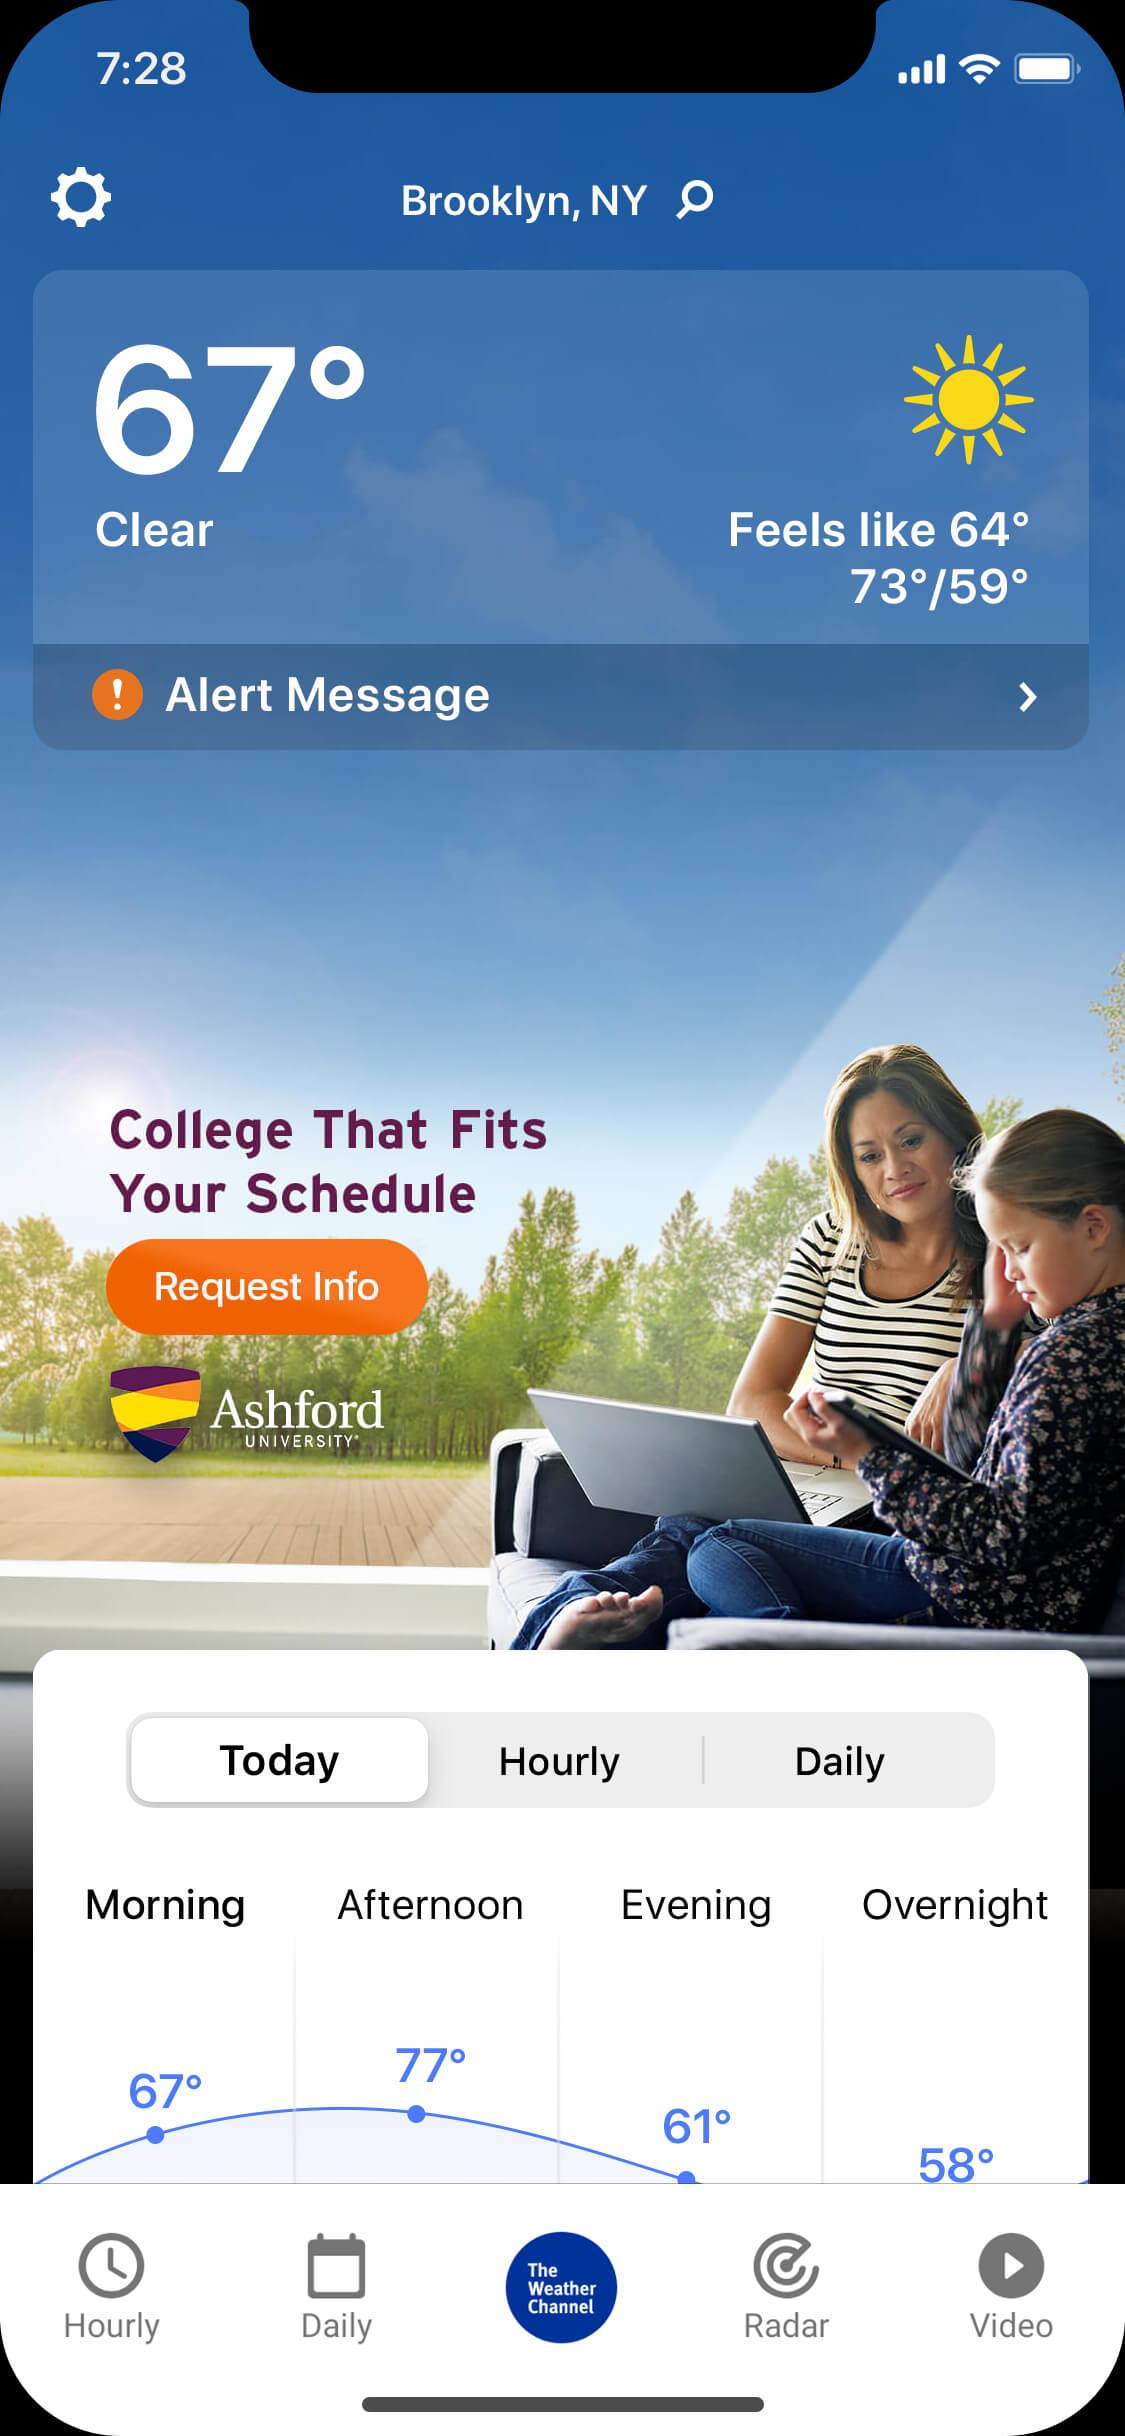 Ashford-University_Mobile_App-IM_clear_day